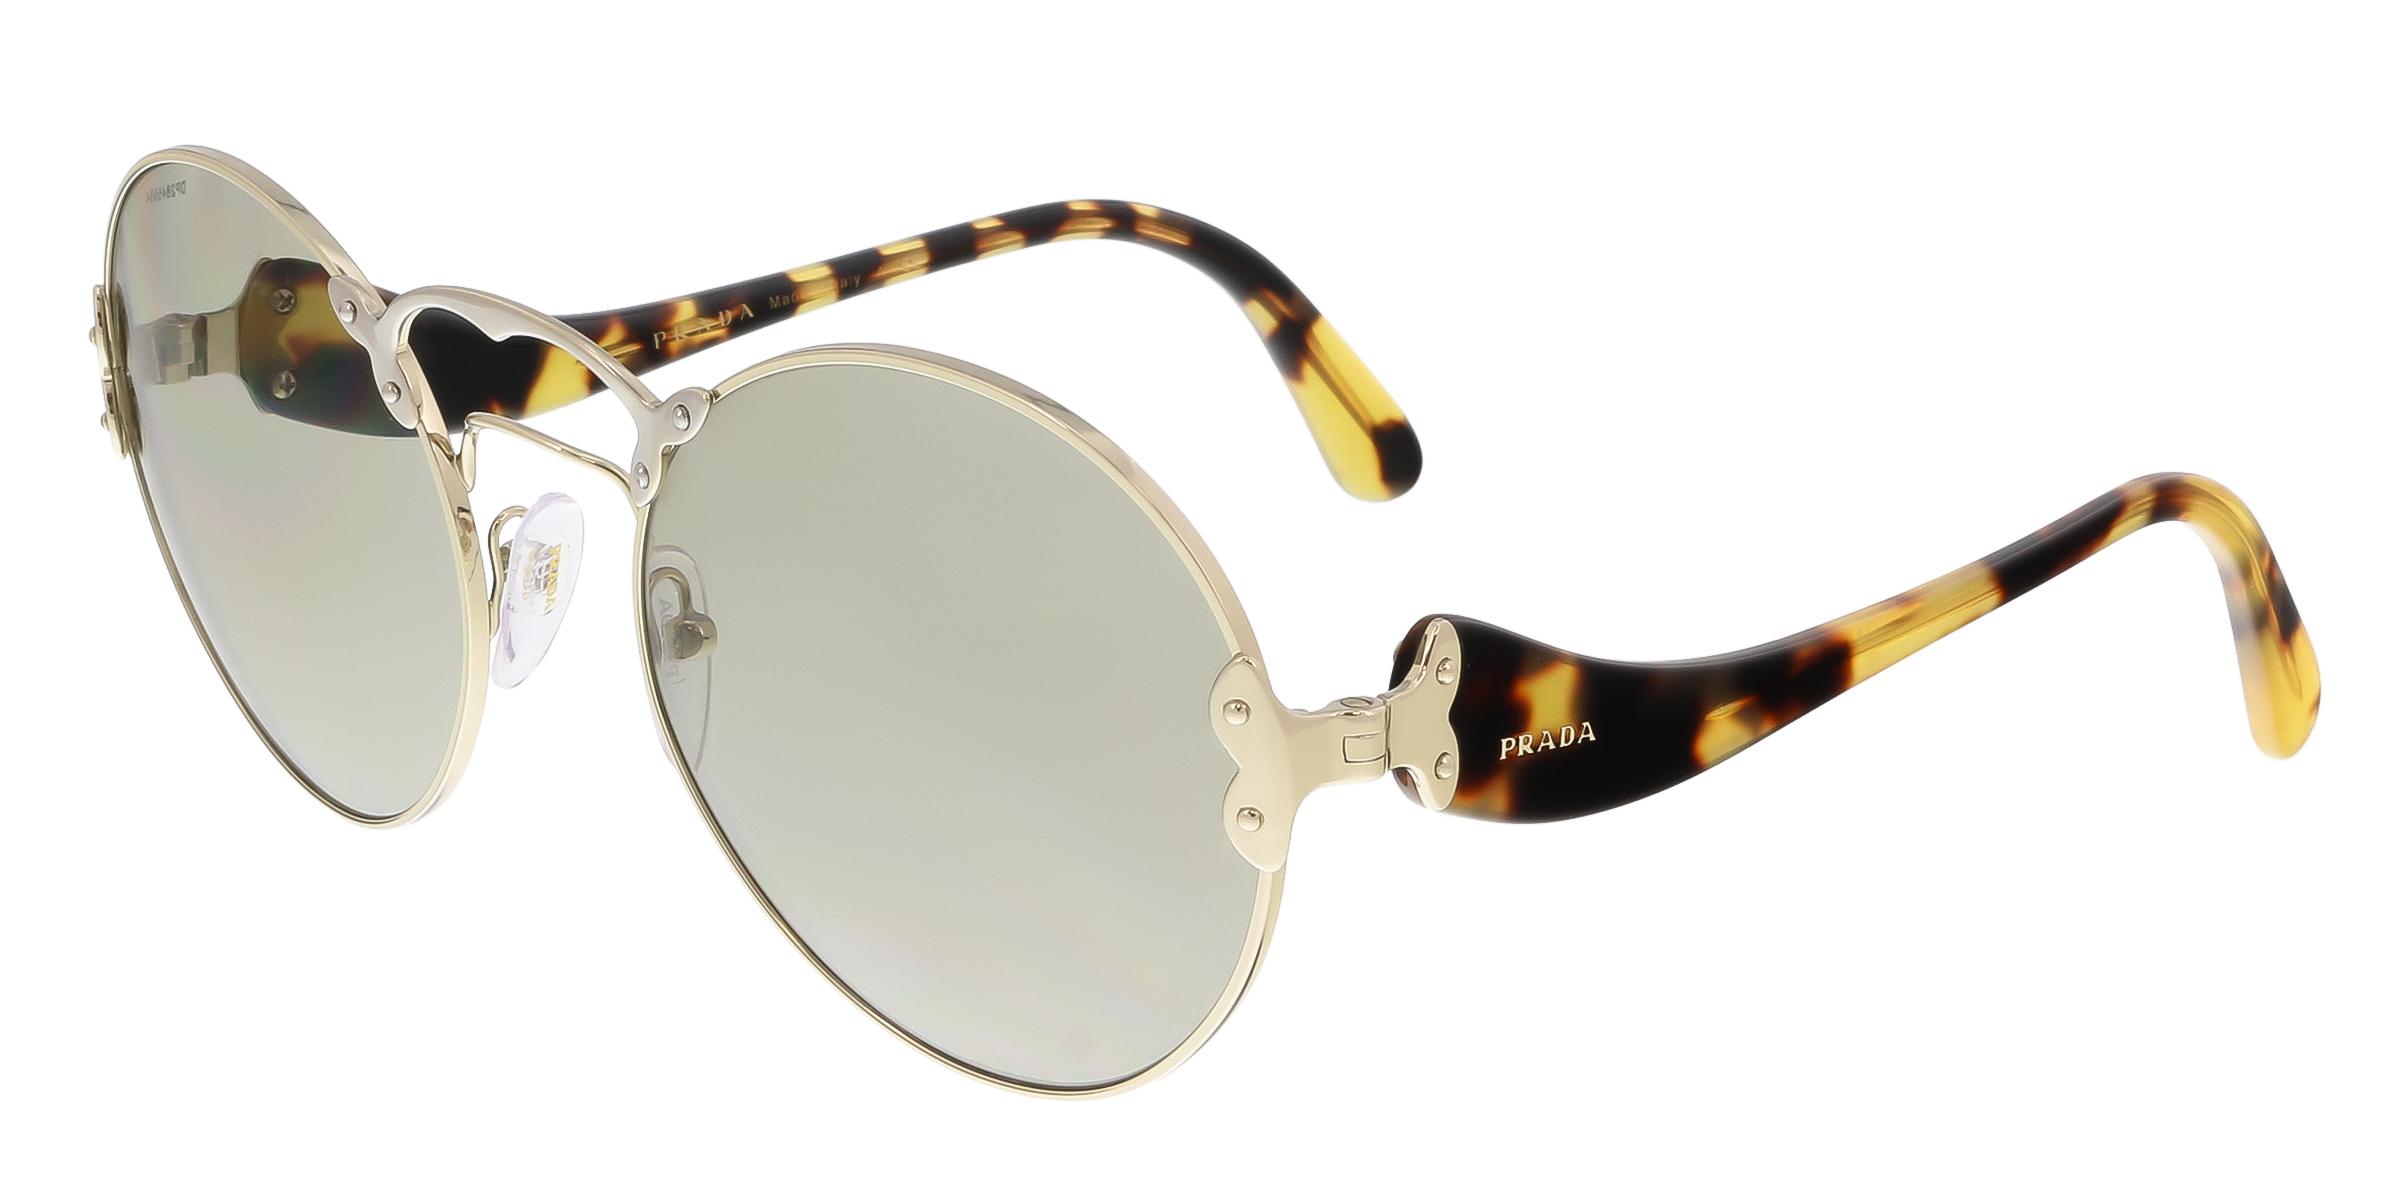 Prada PR 55TS ZVN5J2 Pale Gold/Silver Round Sunglasses